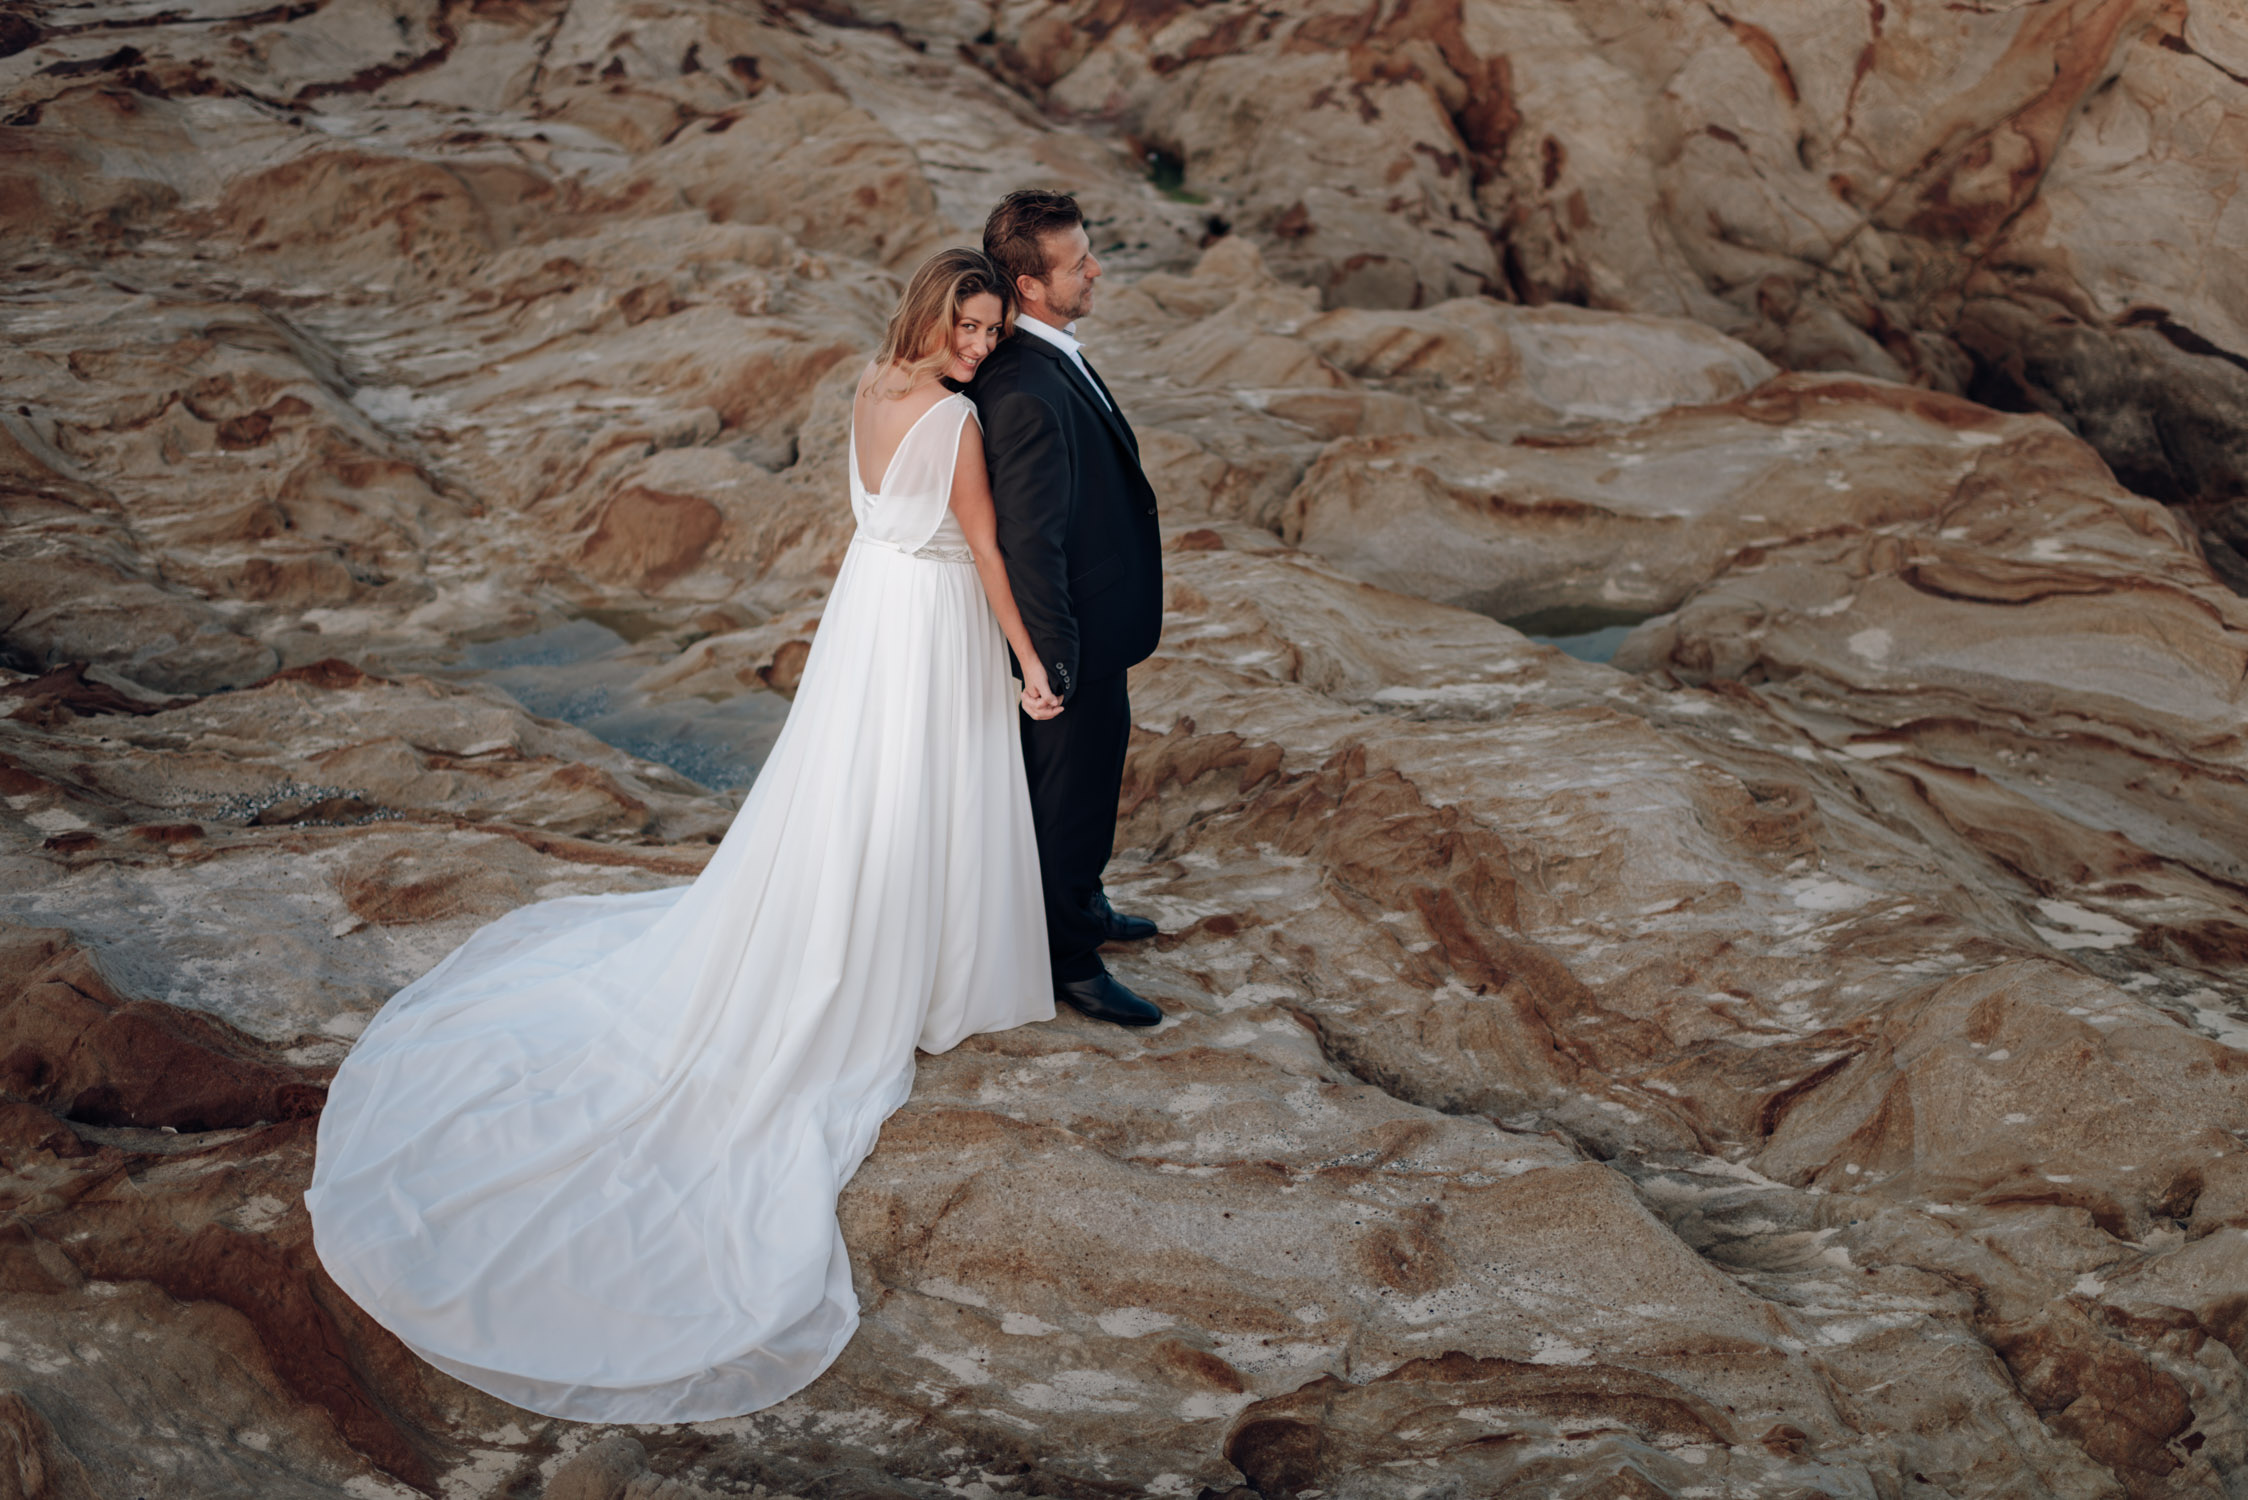 Portada-vanesa-diaz-fotografa-de-bodas-malaga-19